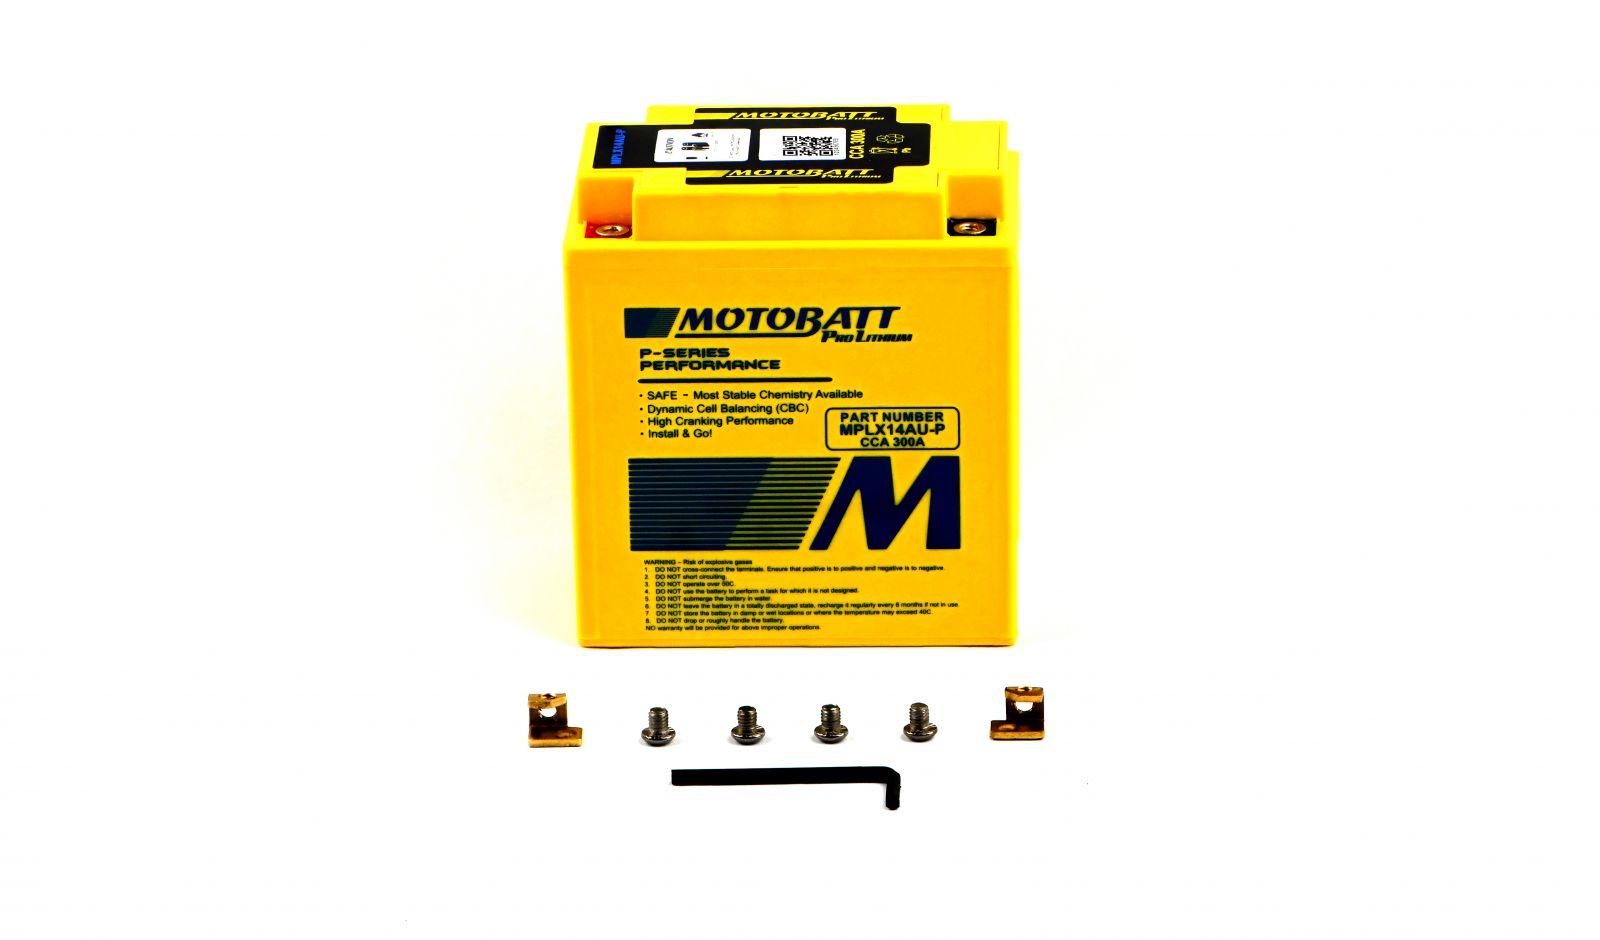 Motobatt Lithium Batteries - 501142ML image